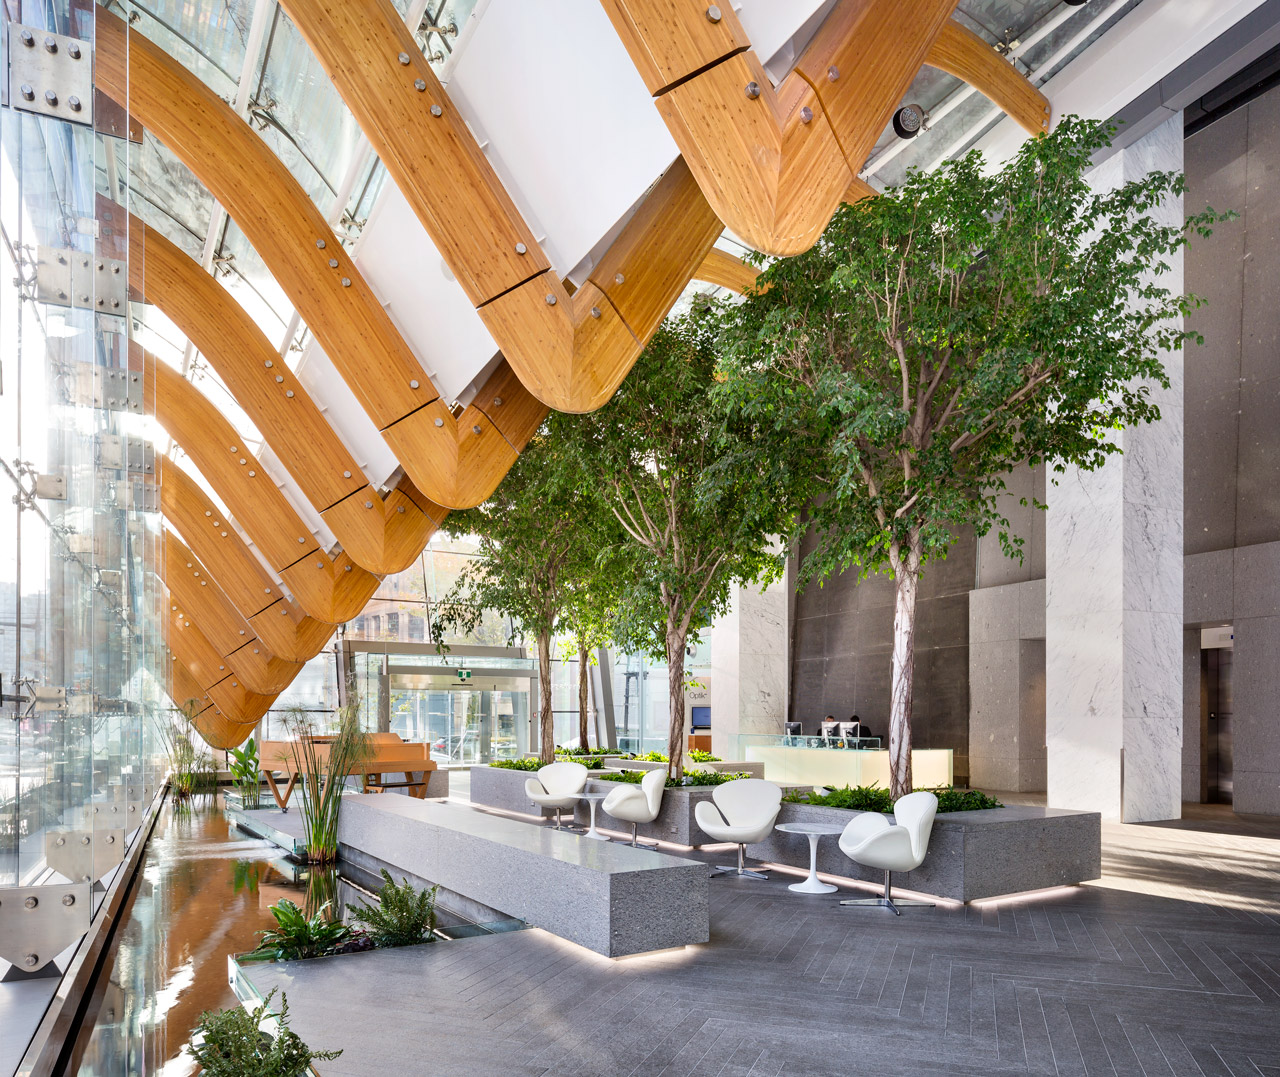 Interior view of the TELUS Garden lobby.